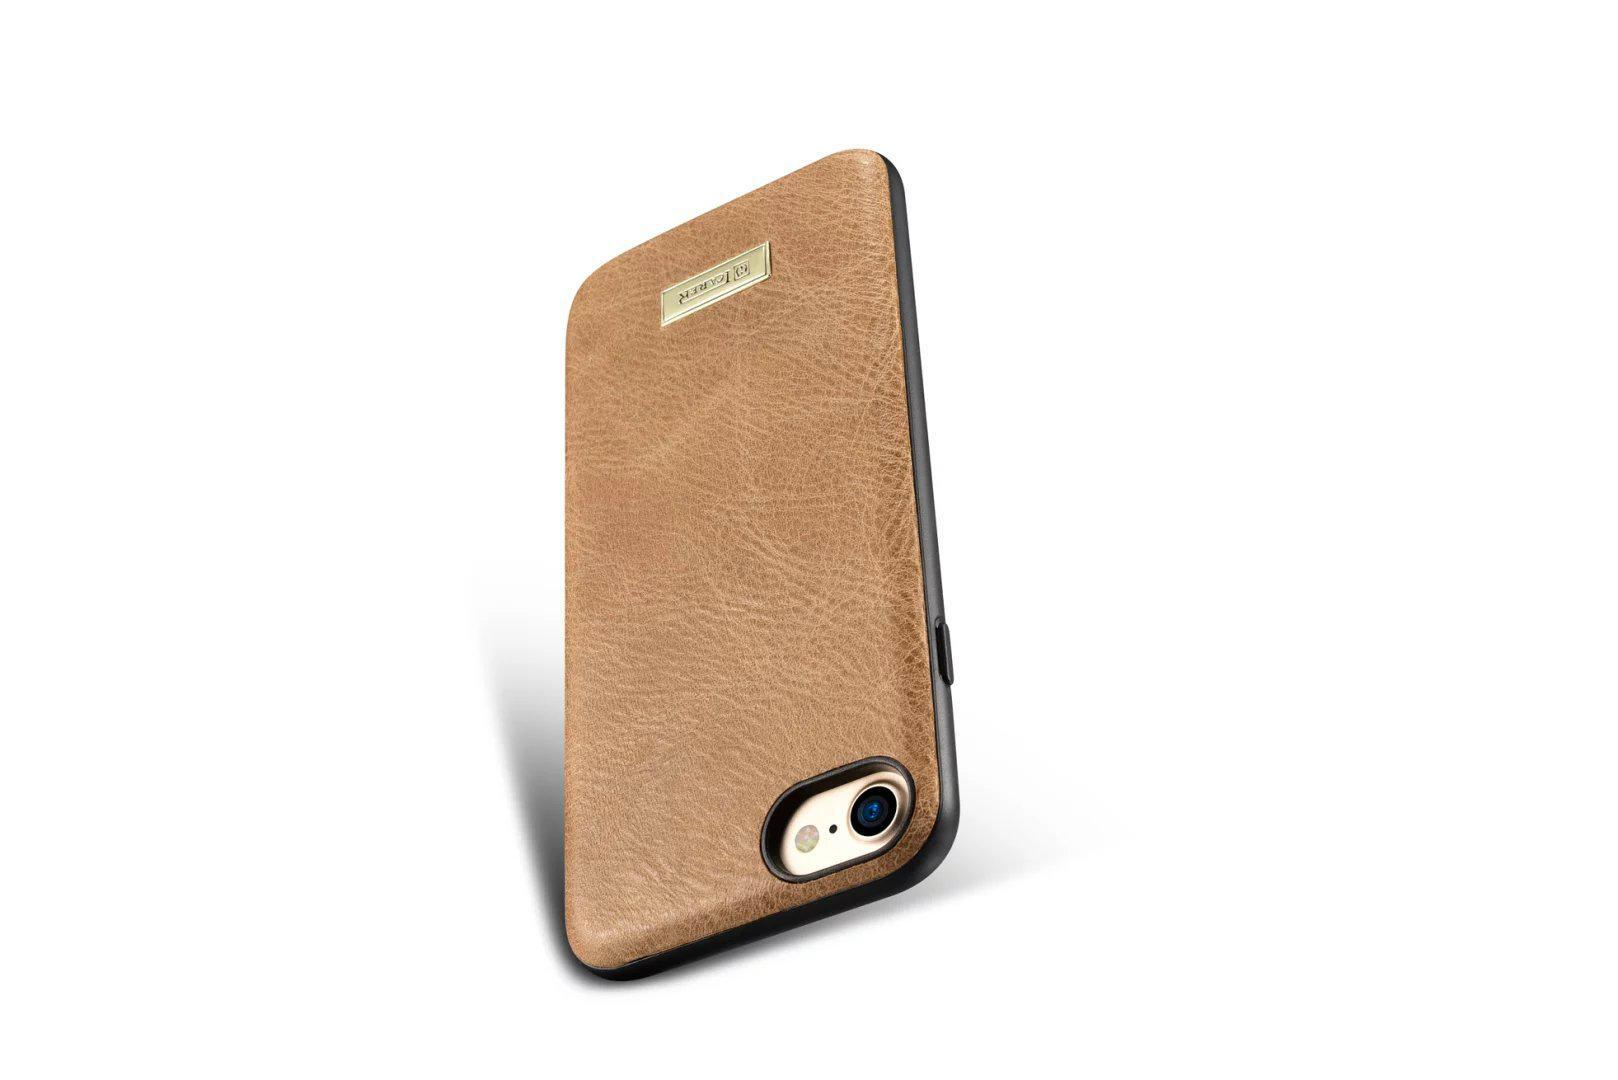 iCarer iPhone 7 Shenzhou Genuine Leather Fashional Back Cover Case 12